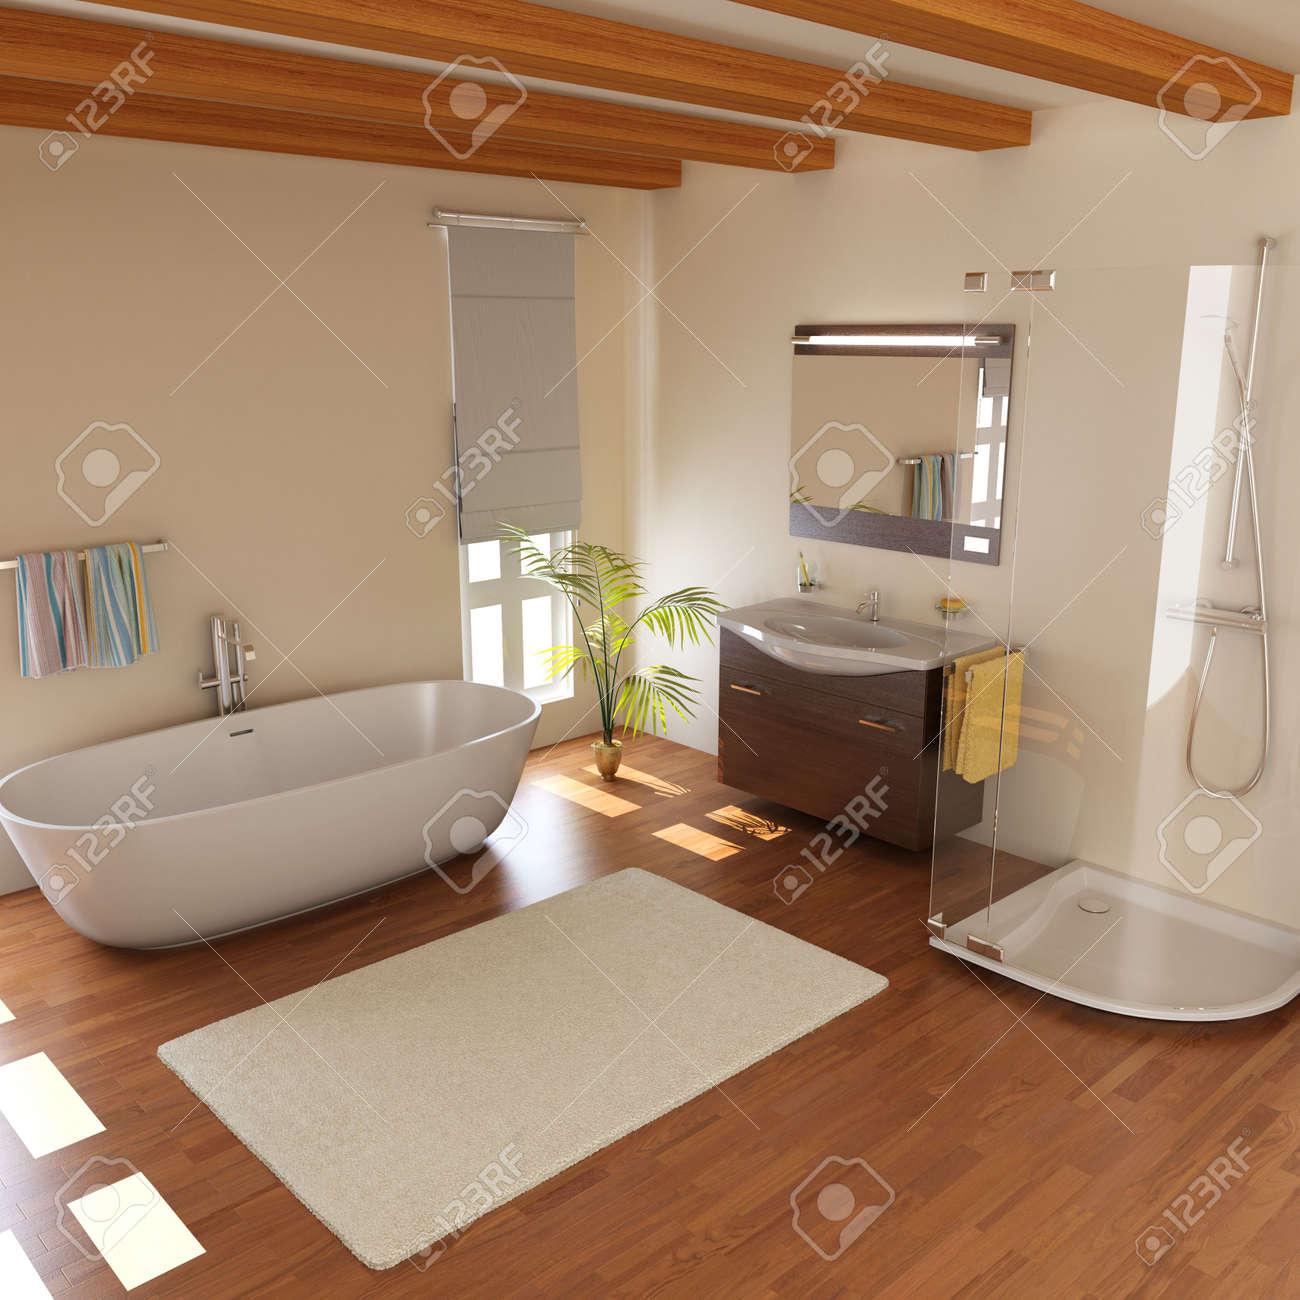 moderne badezimmer bilder | jtleigh - hausgestaltung ideen